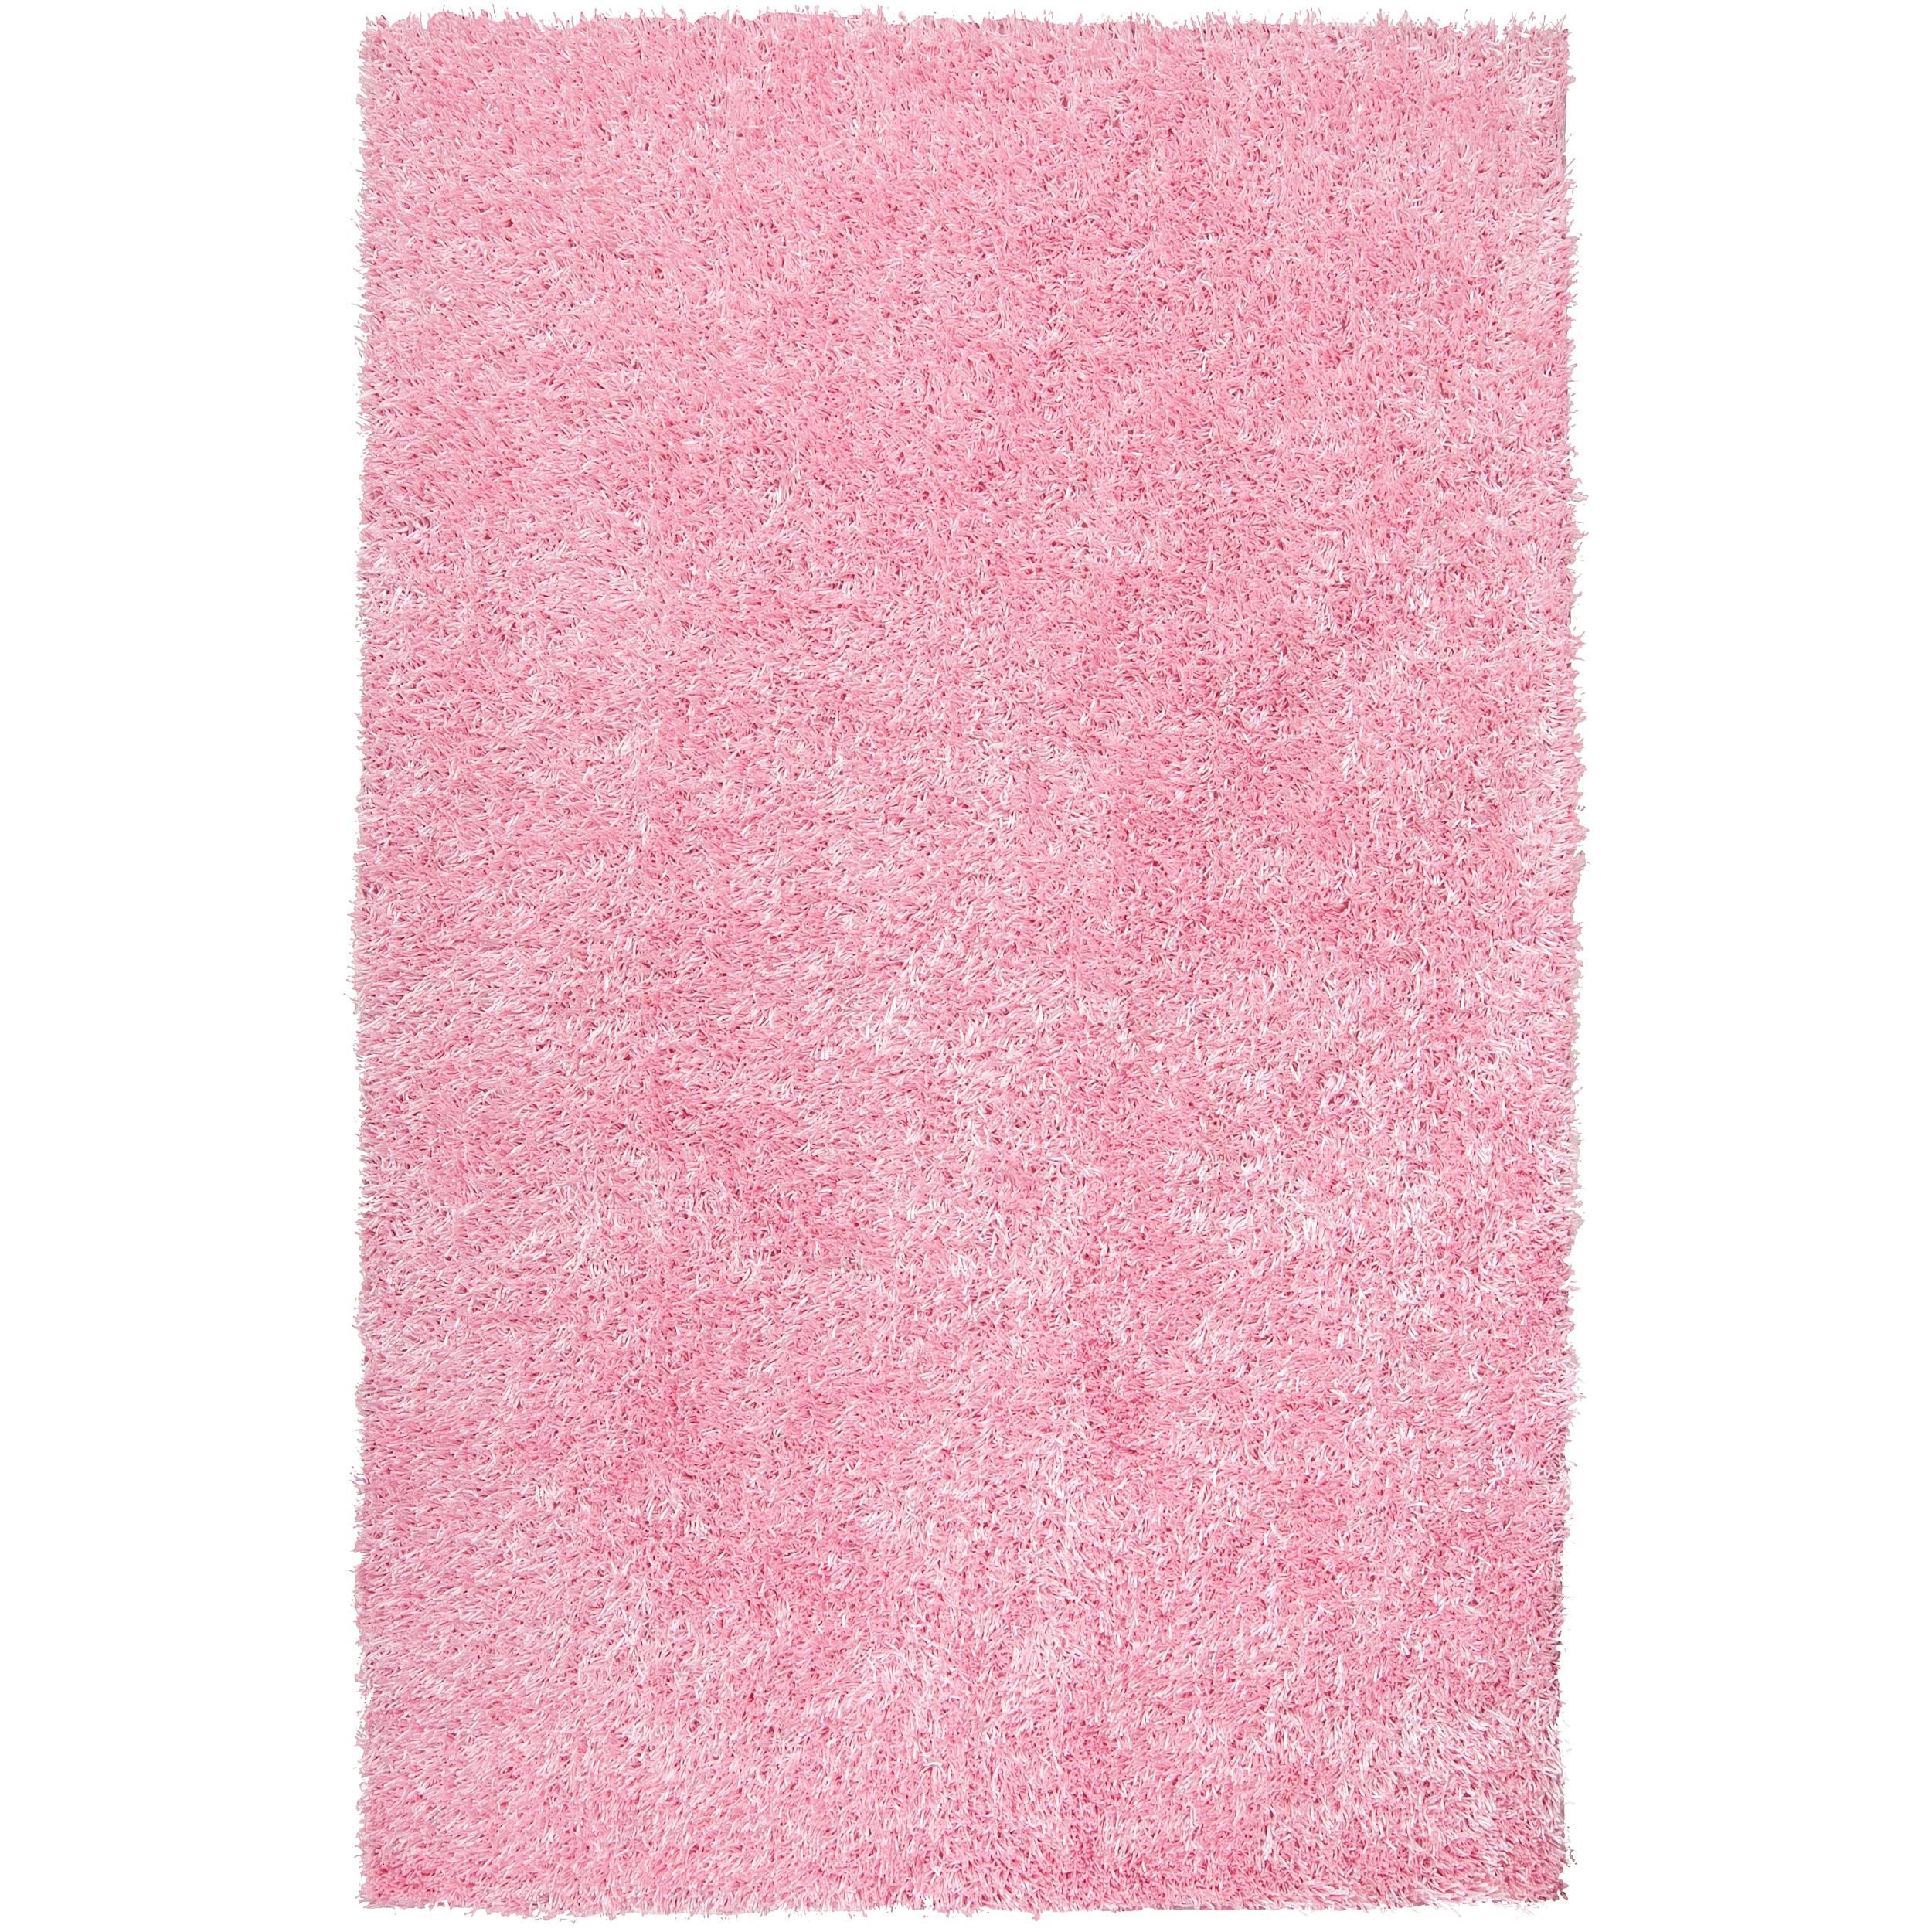 Hand-woven Pink Ferta Soft Shag Rug (5' x 8')